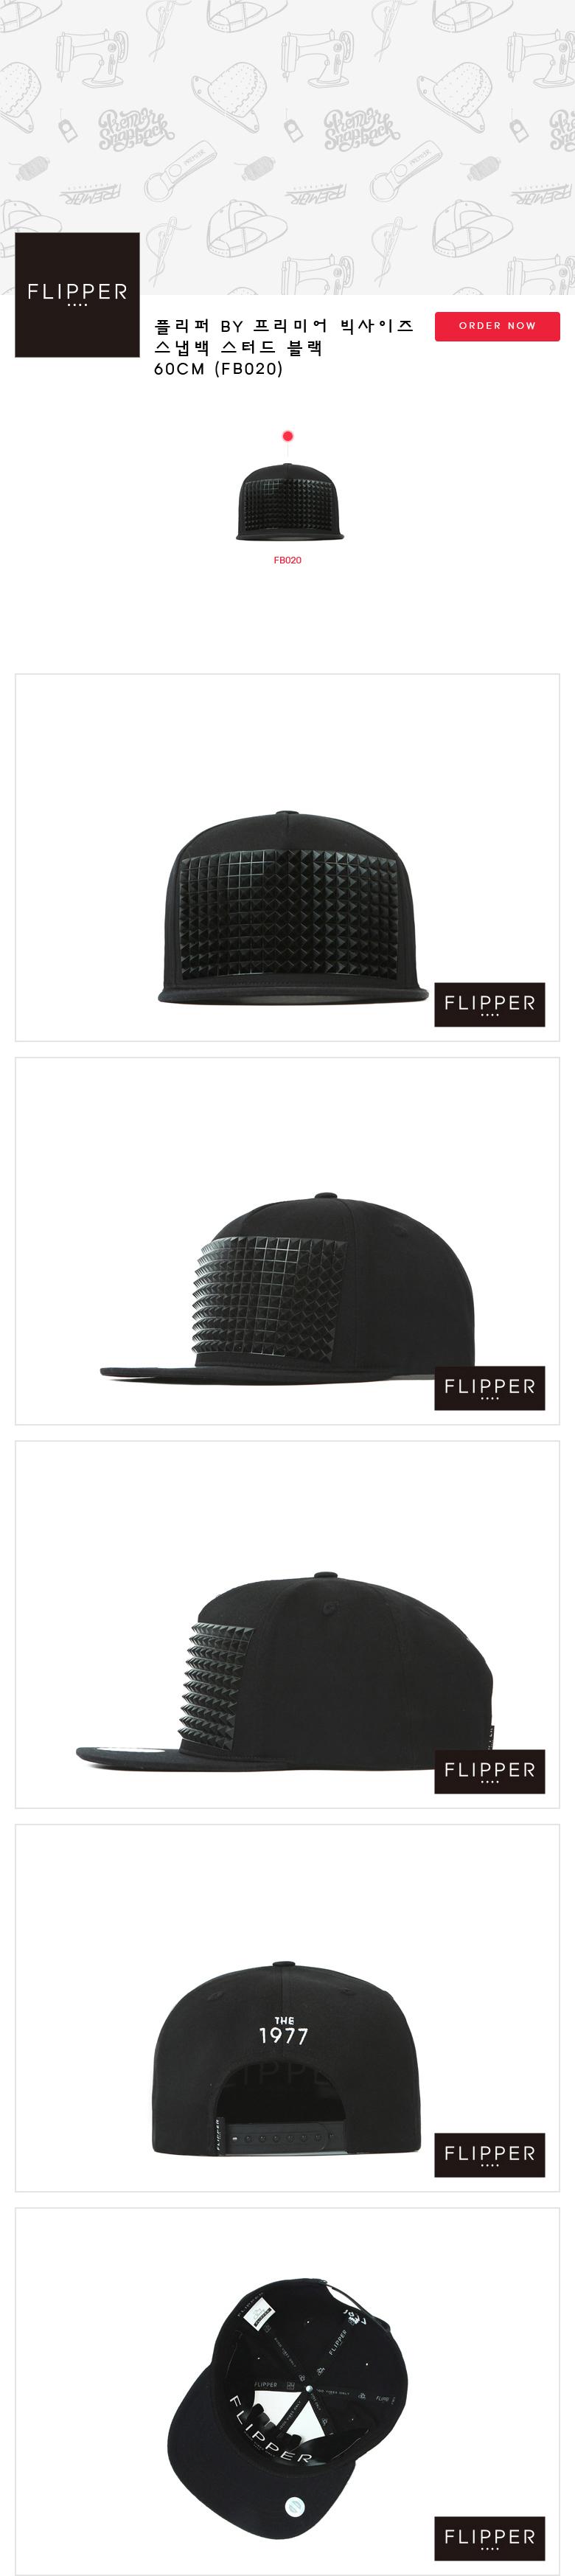 [ PREMIER ] [Premier] Flipper Big Size Snapback Stud Black 60CM (FB020)